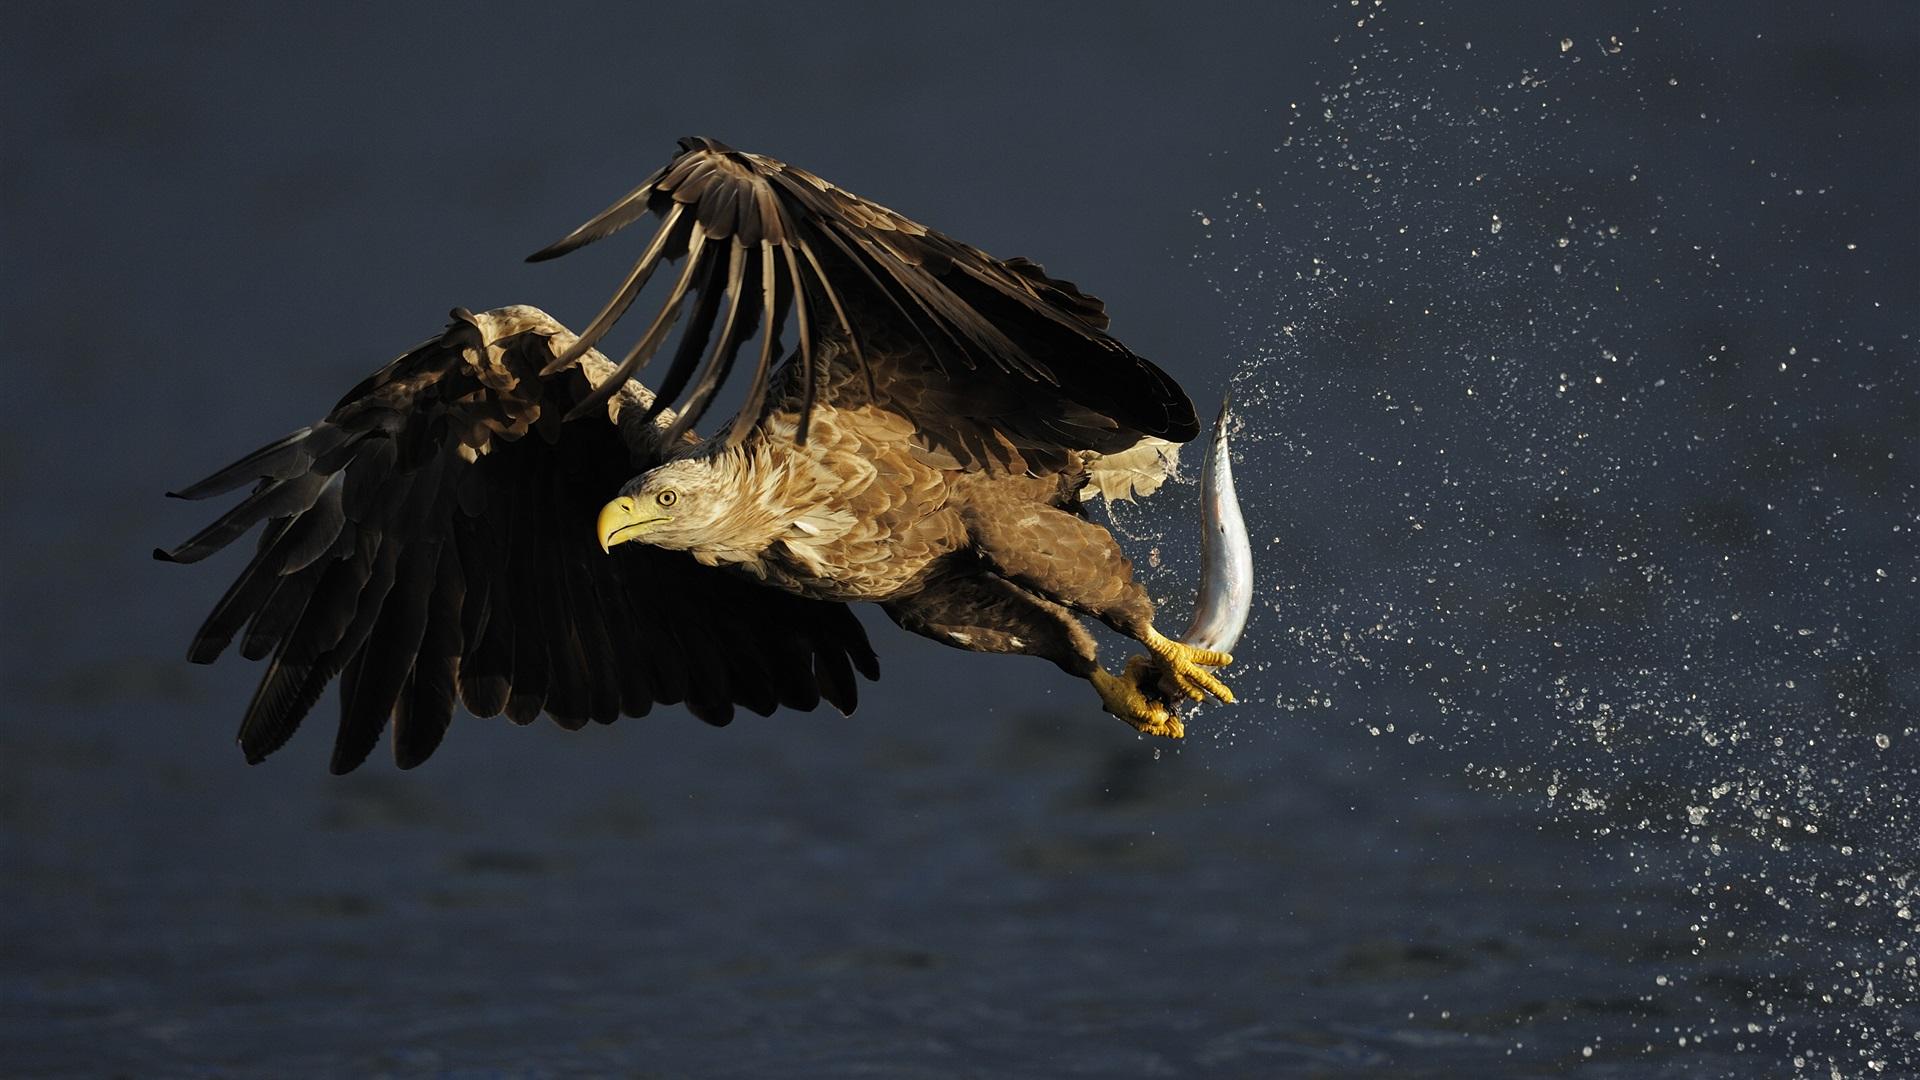 download wallpaper 1920x1080 eagle hunting fish water